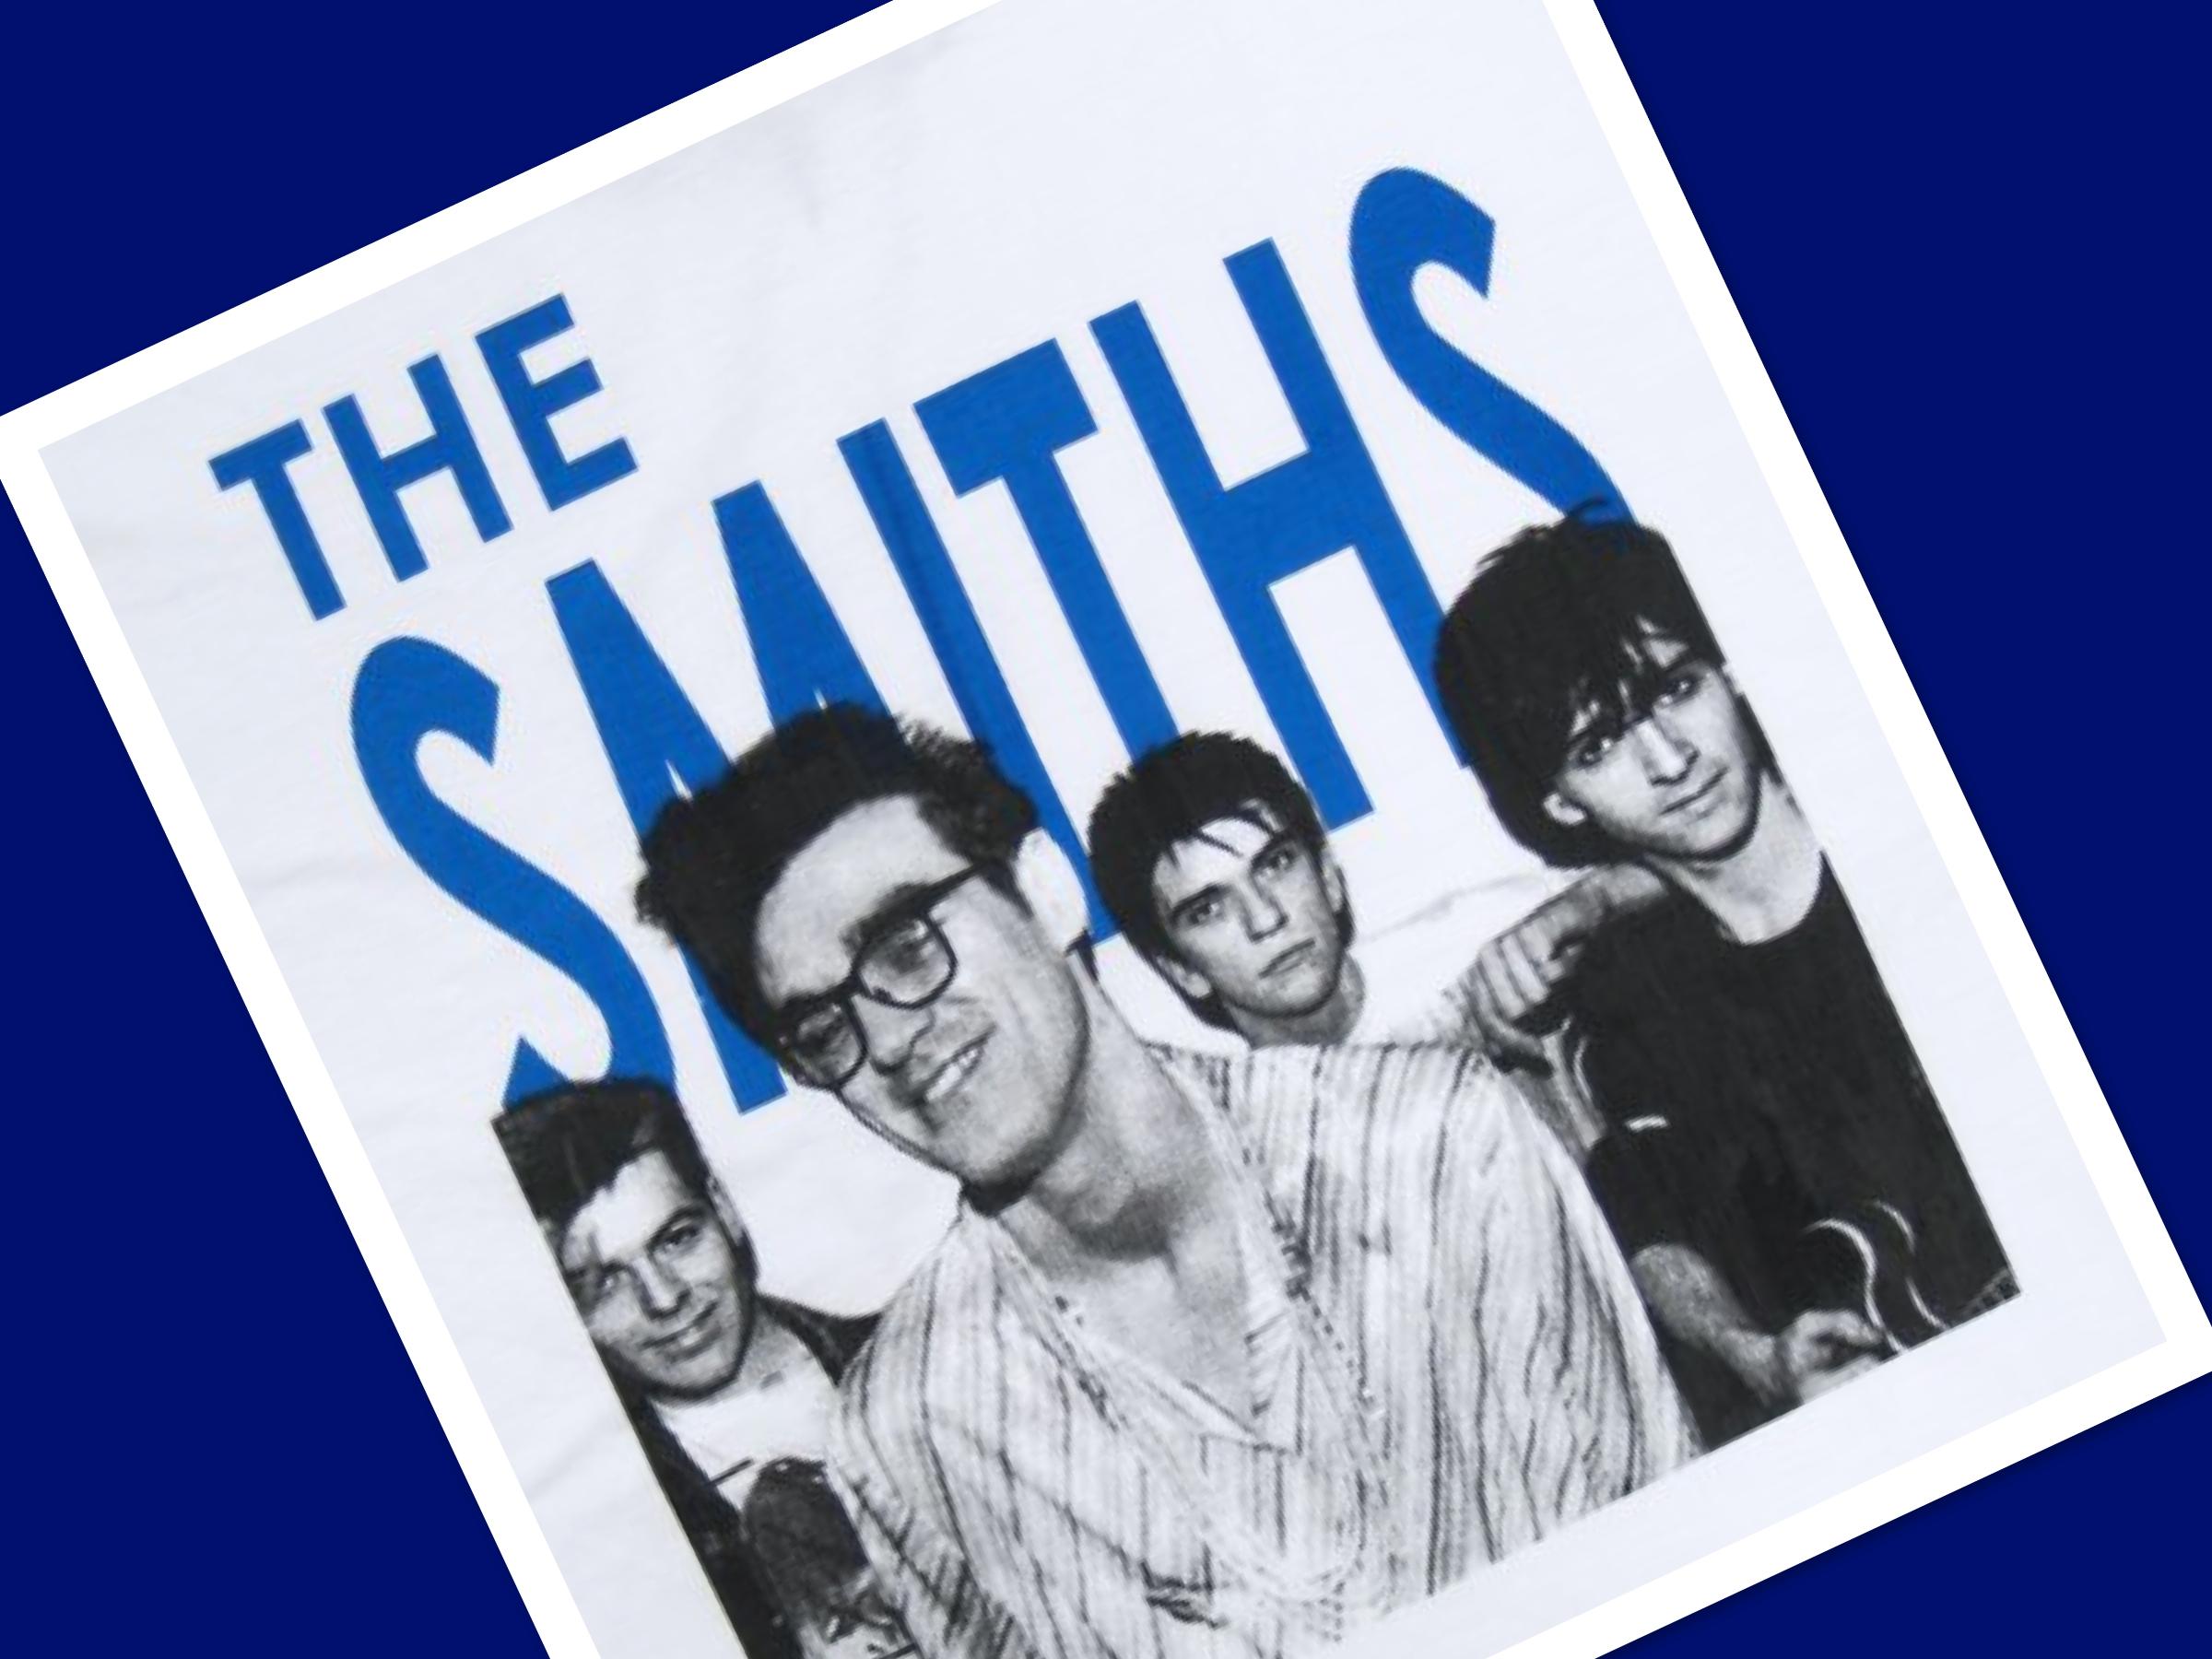 The Smiths T-shirt, alternative rock band, Jimmy Fallon, Tonight Show, Will Smith